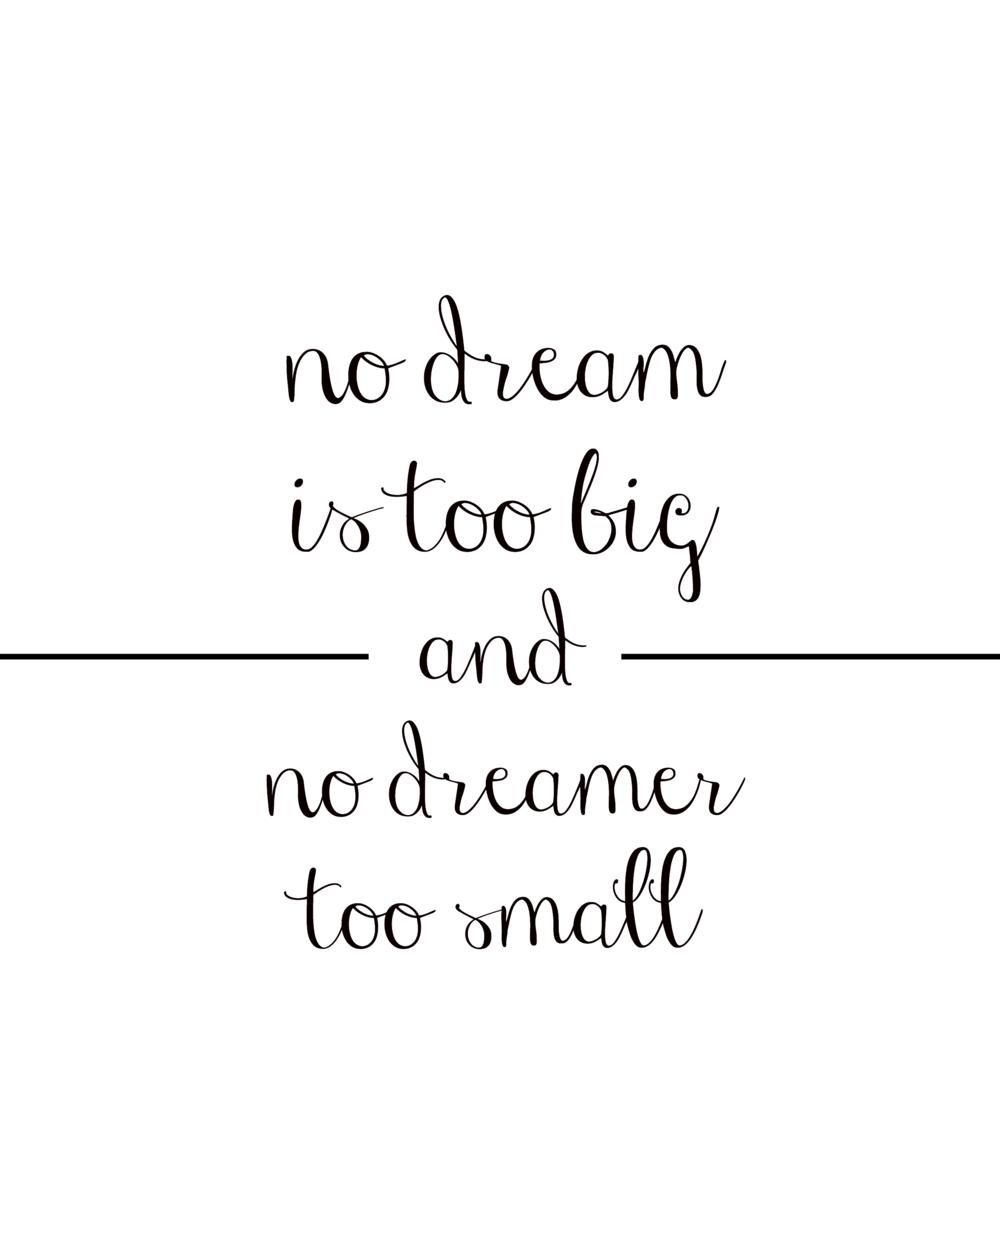 Motivation+Monday+||+Dreamer